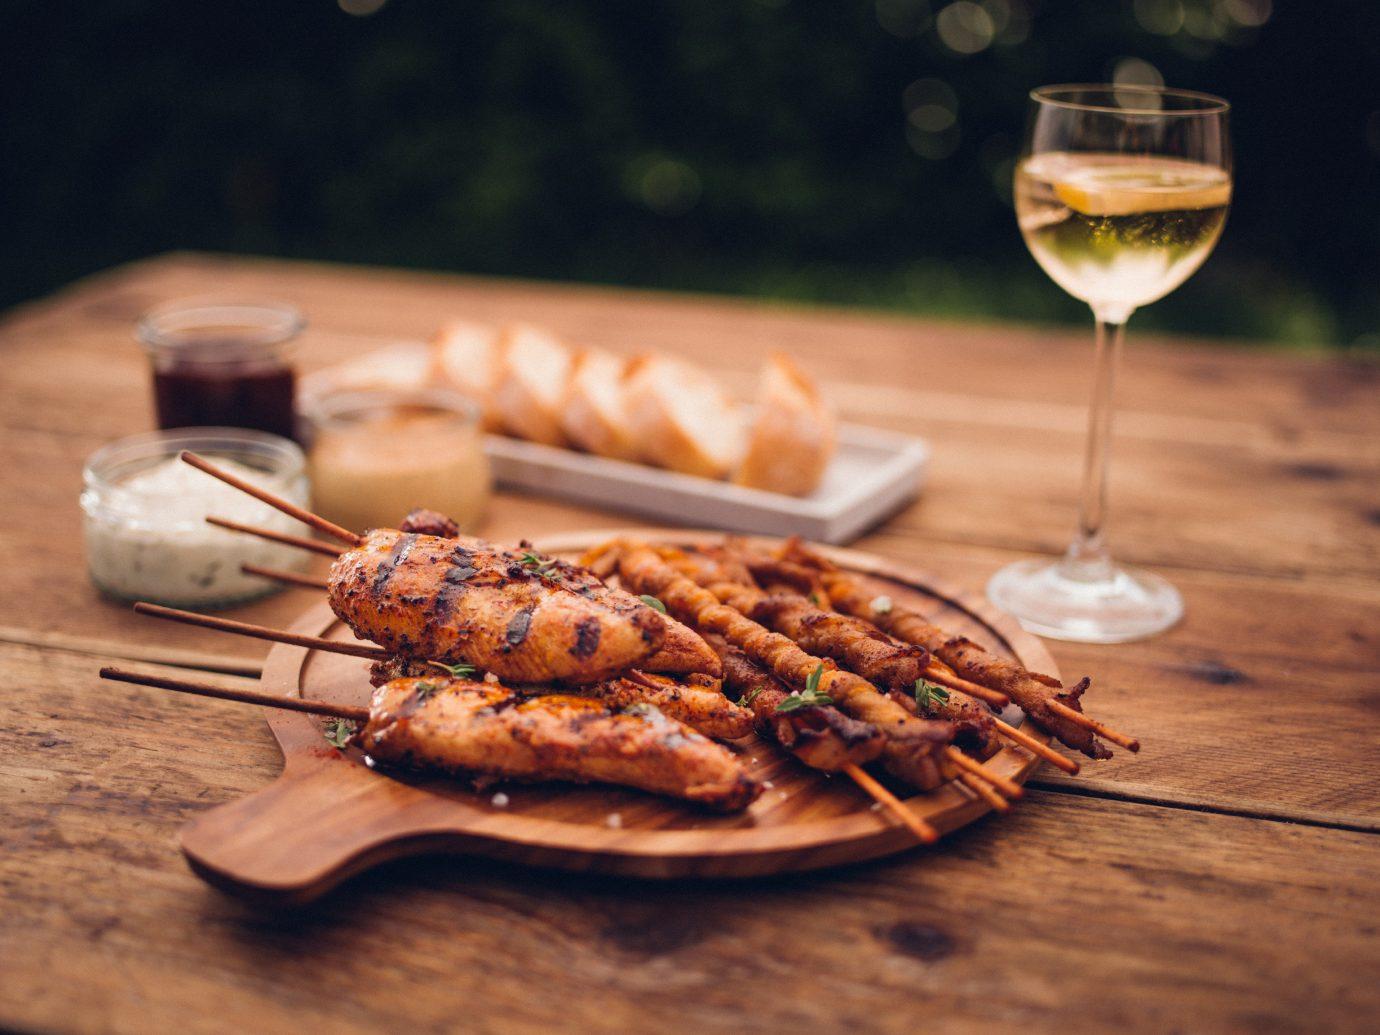 Food + Drink table wooden food wine indoor plate dish meal Seafood sense restaurant produce cuisine invertebrate meat